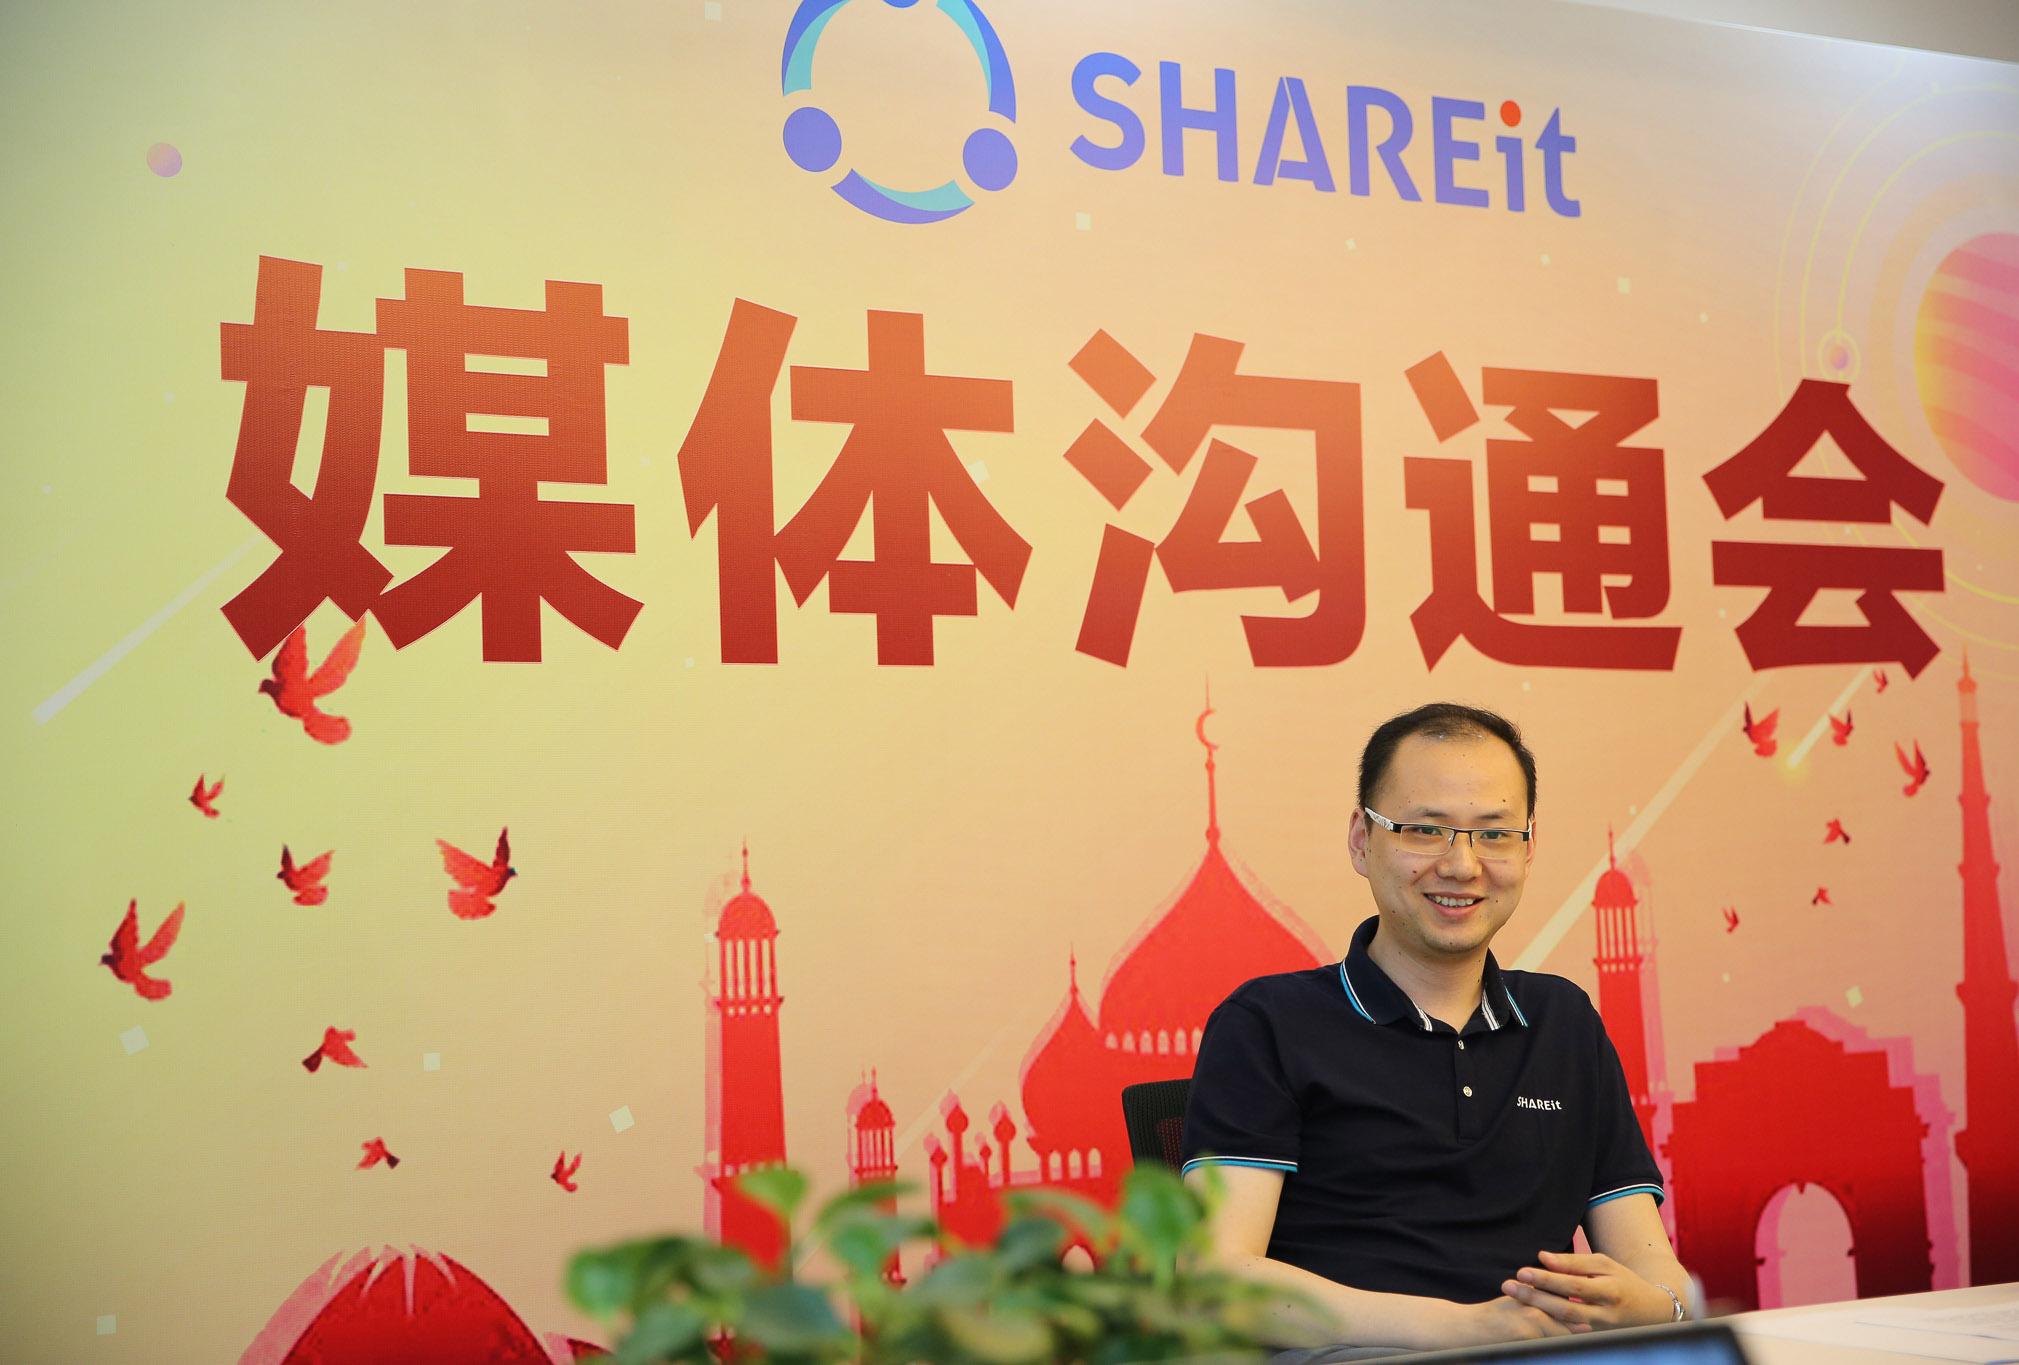 SHAREit任命新COO 引领新兴市场未来发展路径